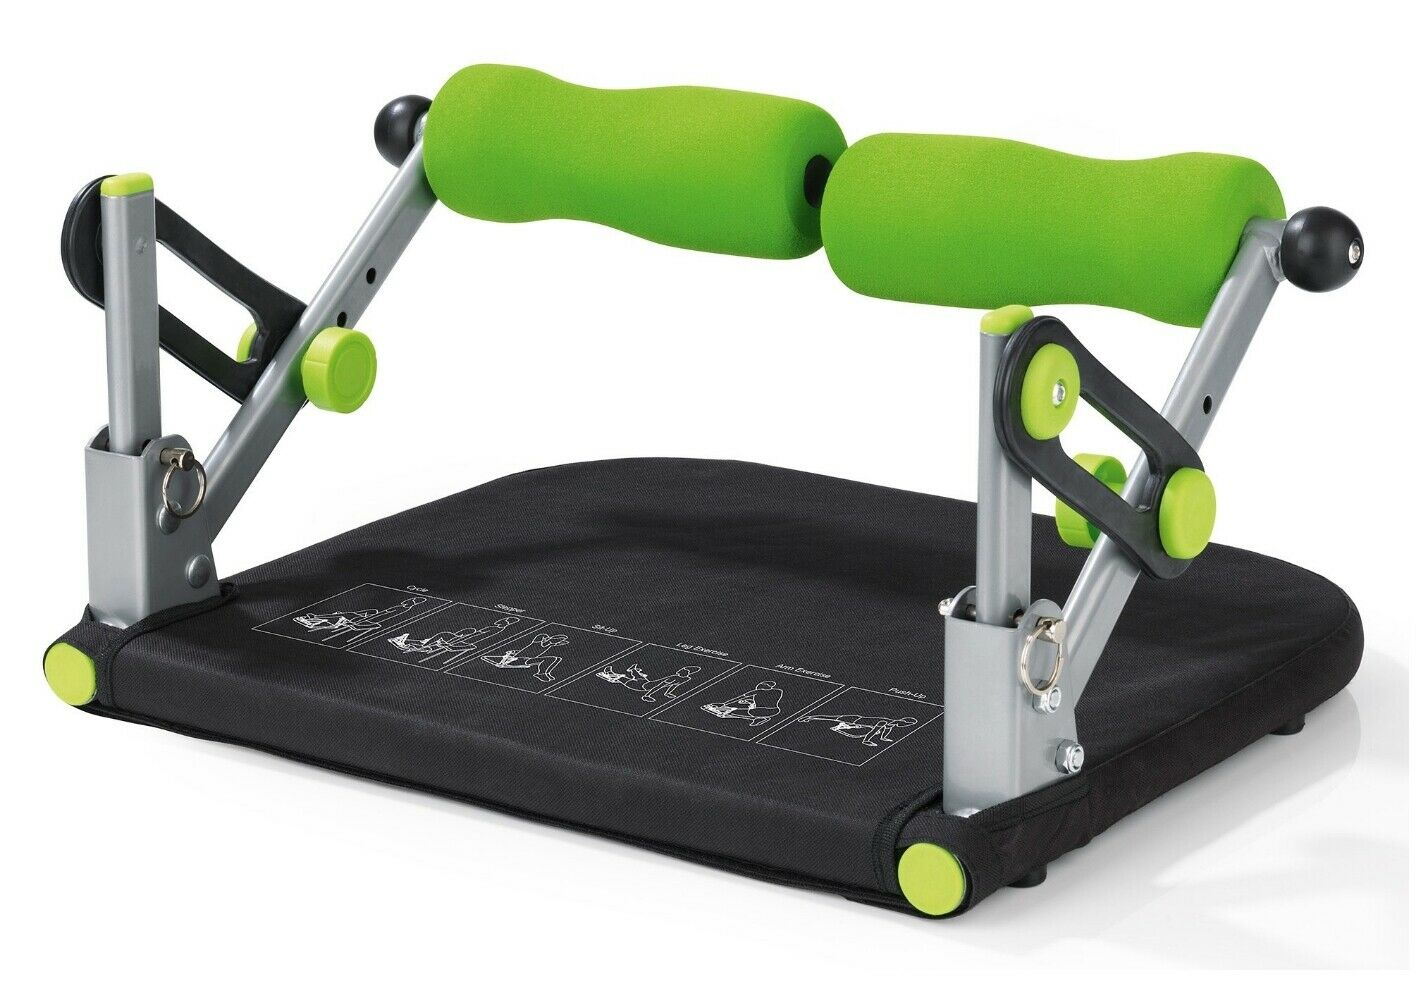 Vitalmaxx 5 en  1 body Fitness entrenador Basic hogar entrenador OVP  nuevo  (1005)  últimos estilos